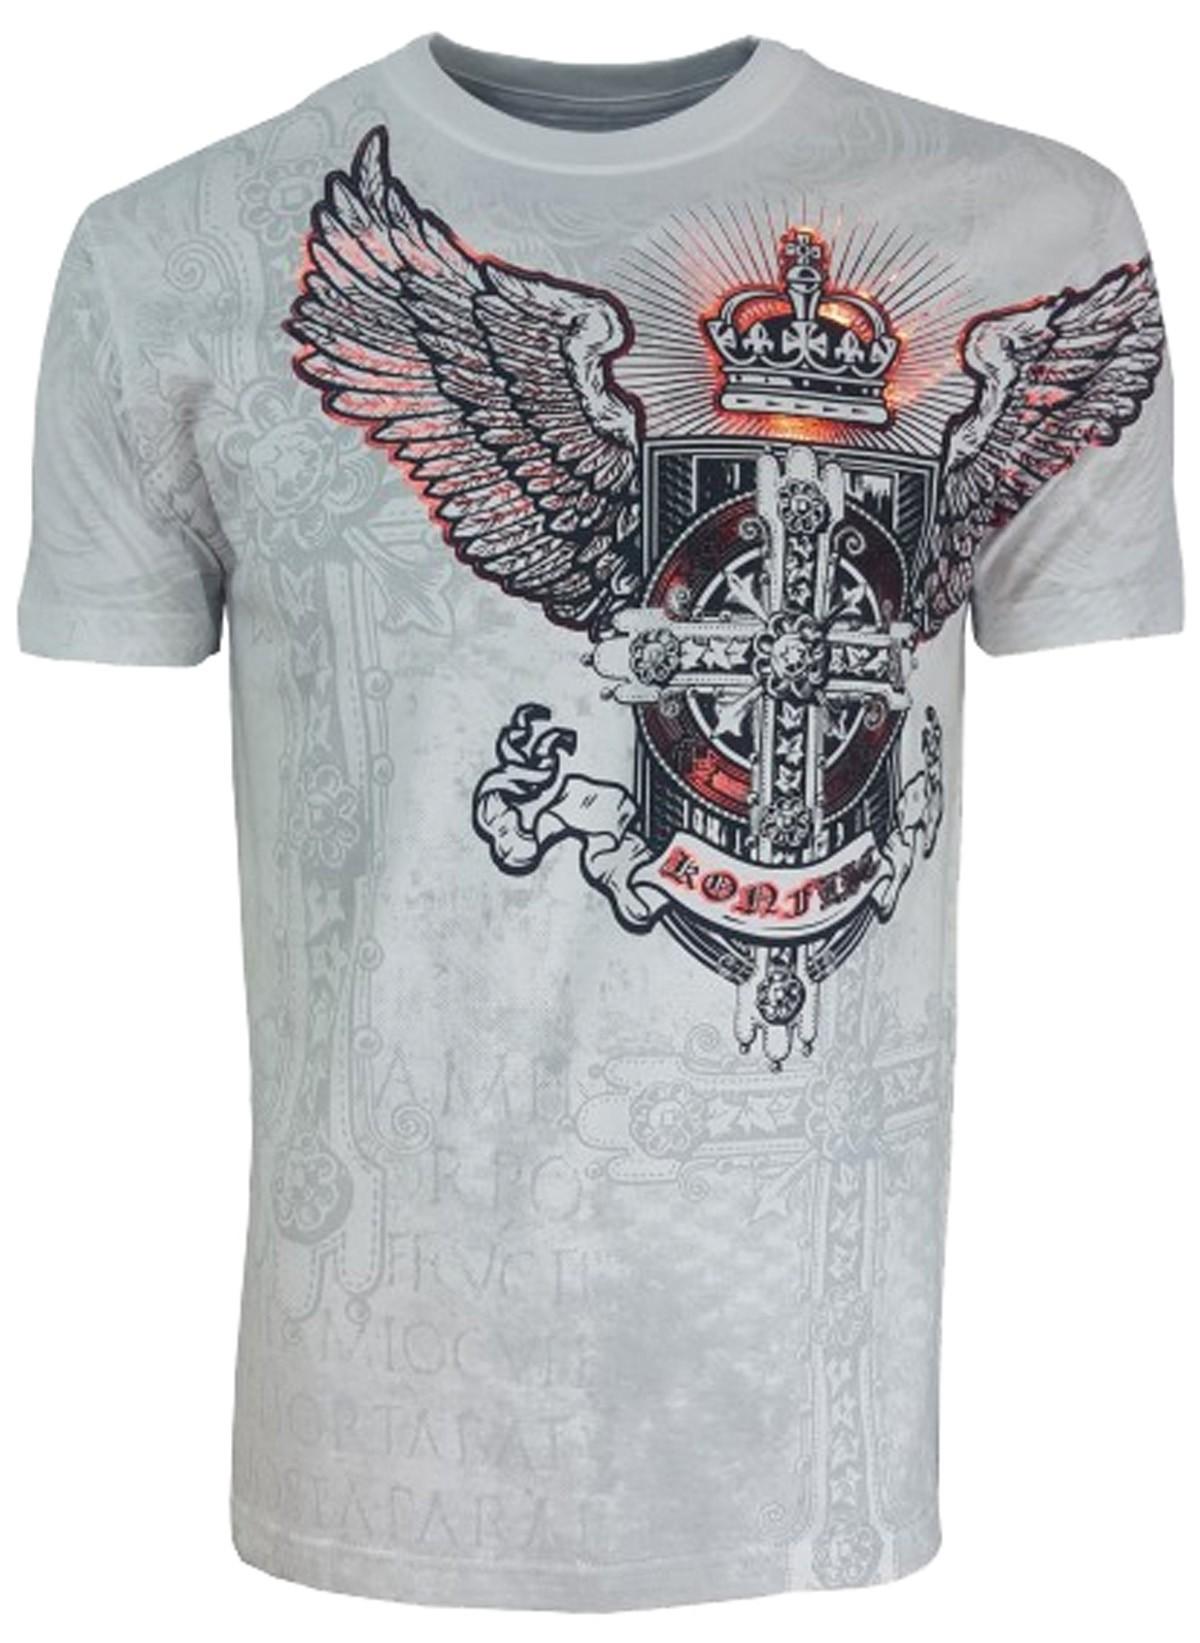 Konflic Clothing - Burning Wings T-Shirt